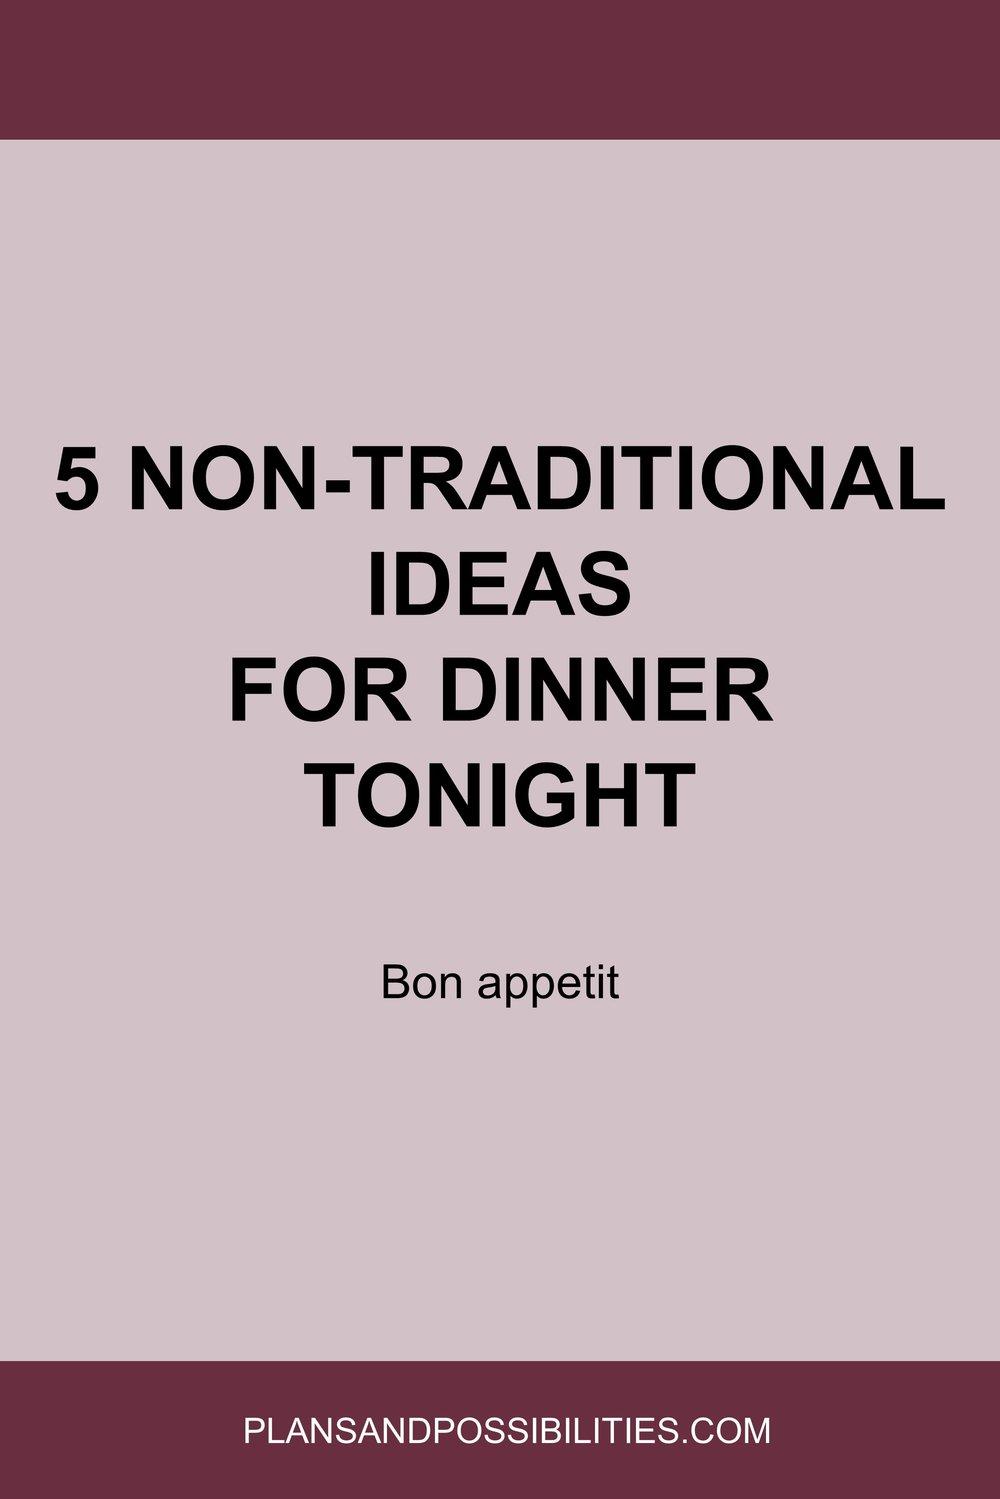 5-Non-Traditional-Ideas-For-Dinner-Tonight.jpg